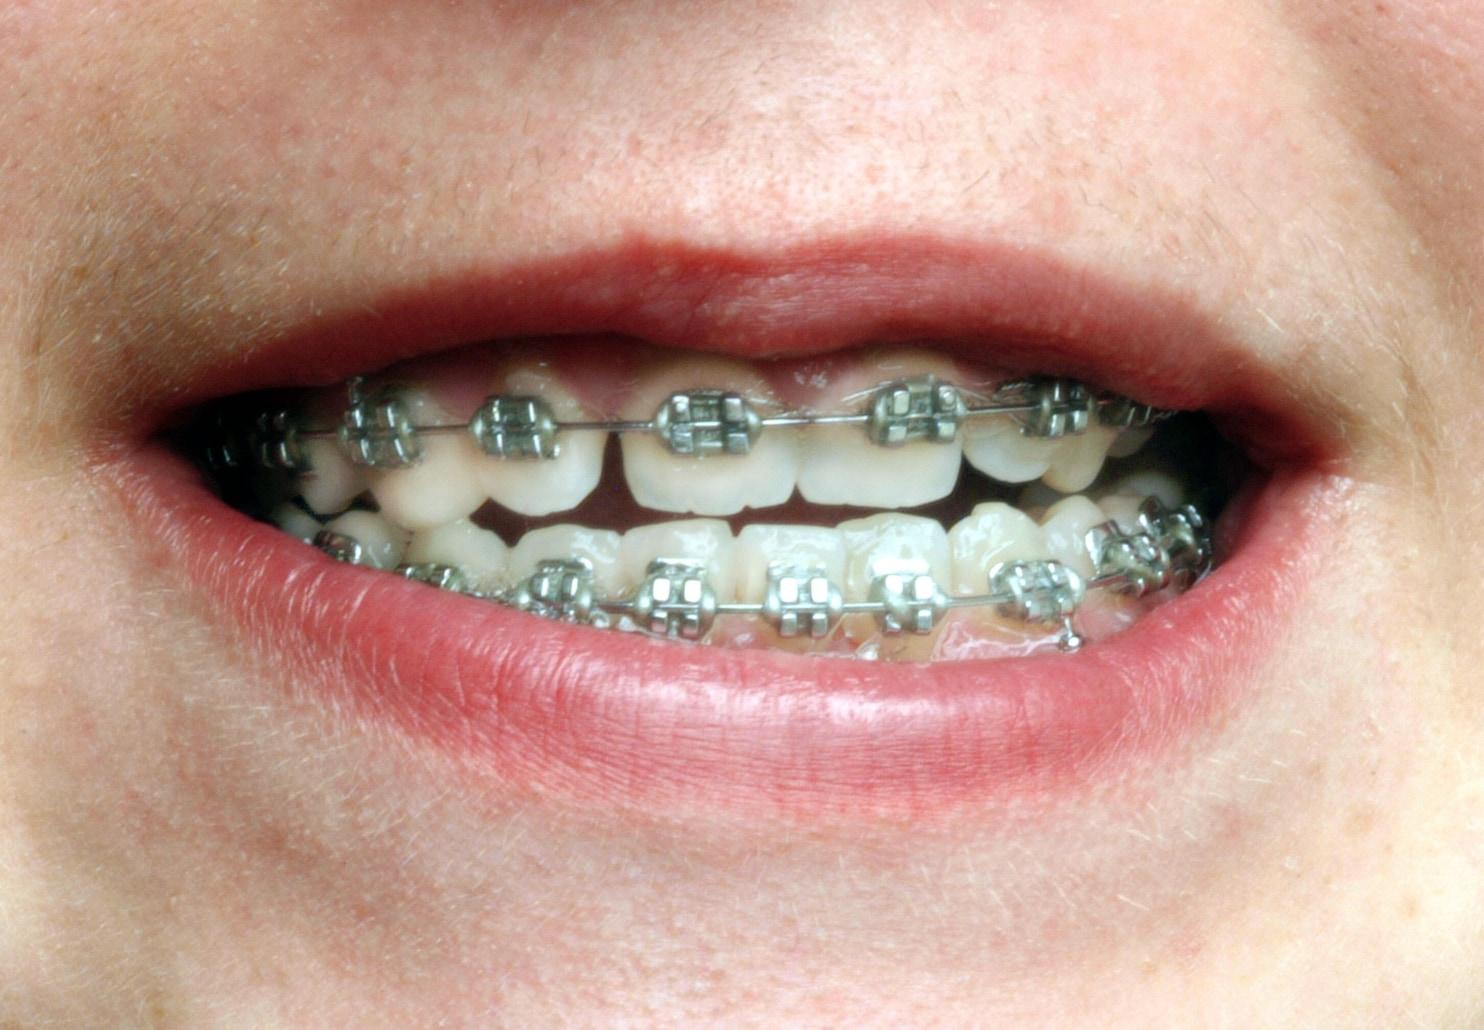 How To Make Fake Braces Teeth - Year of Clean Water